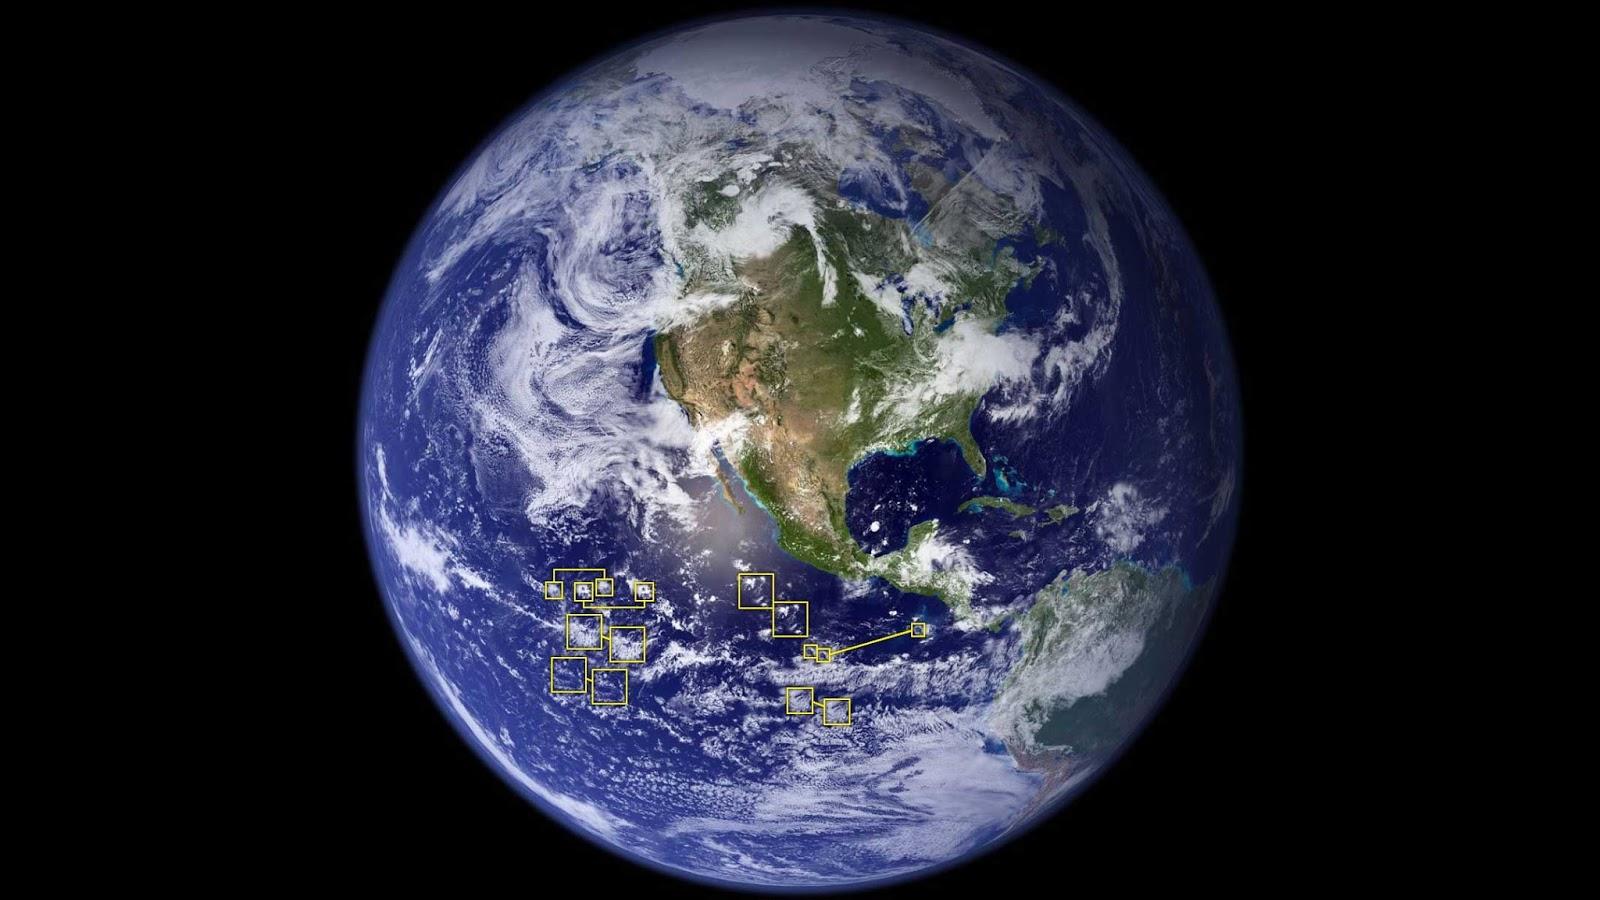 https://3.bp.blogspot.com/-KgdHjJGxA0Q/Vt5fUk5bwYI/AAAAAAAAAbE/5C2BHxSyrdk/s1600/fake-earth-photo.jpg